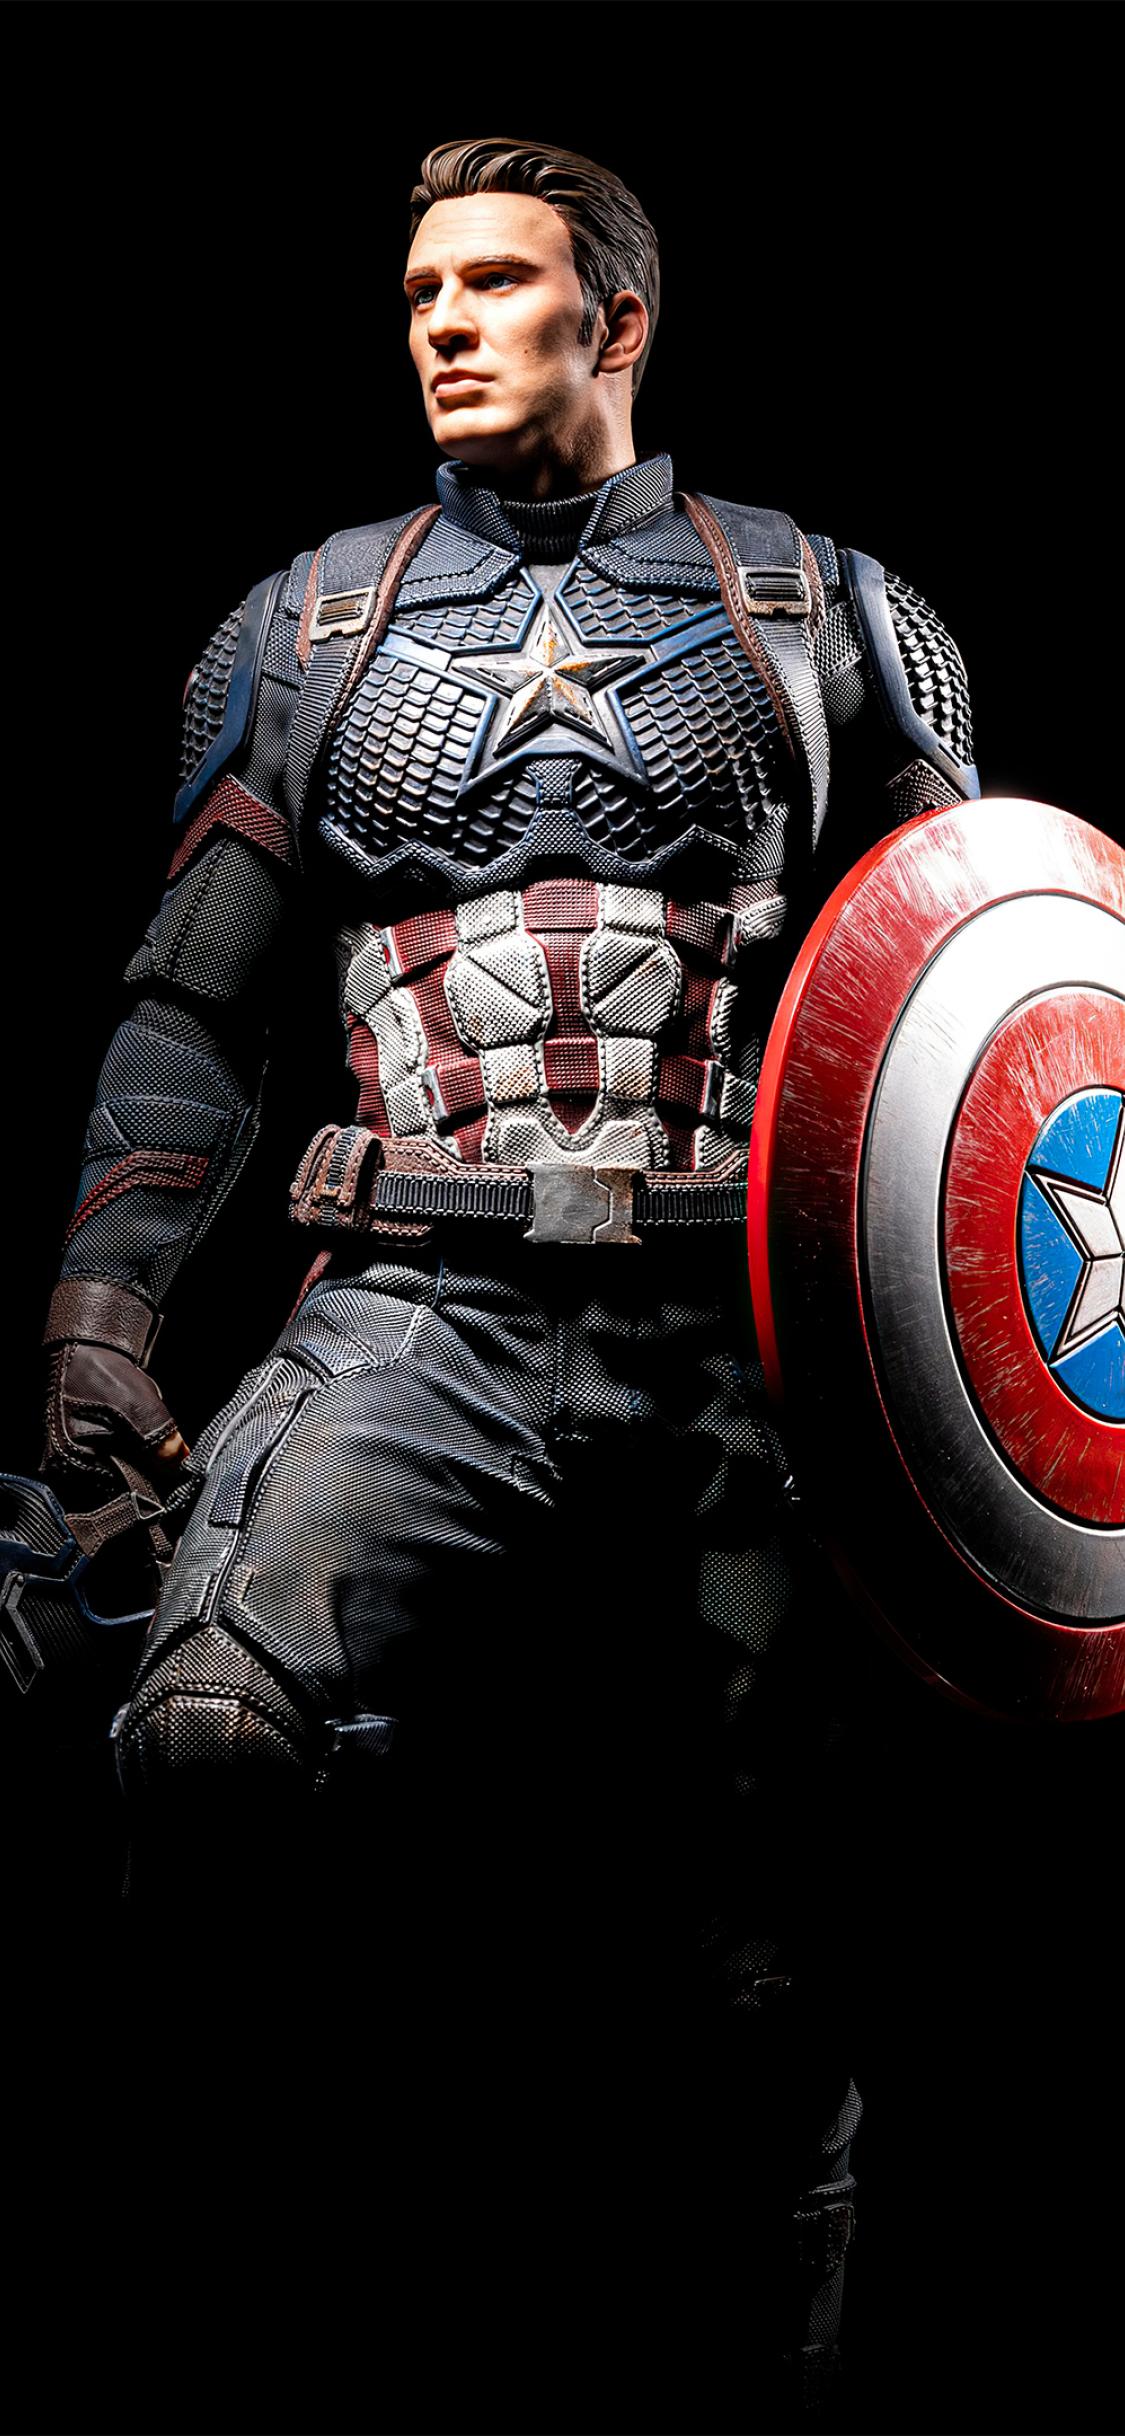 1125x2436 Captain America Portrait Art Iphone XS,Iphone 10 ...